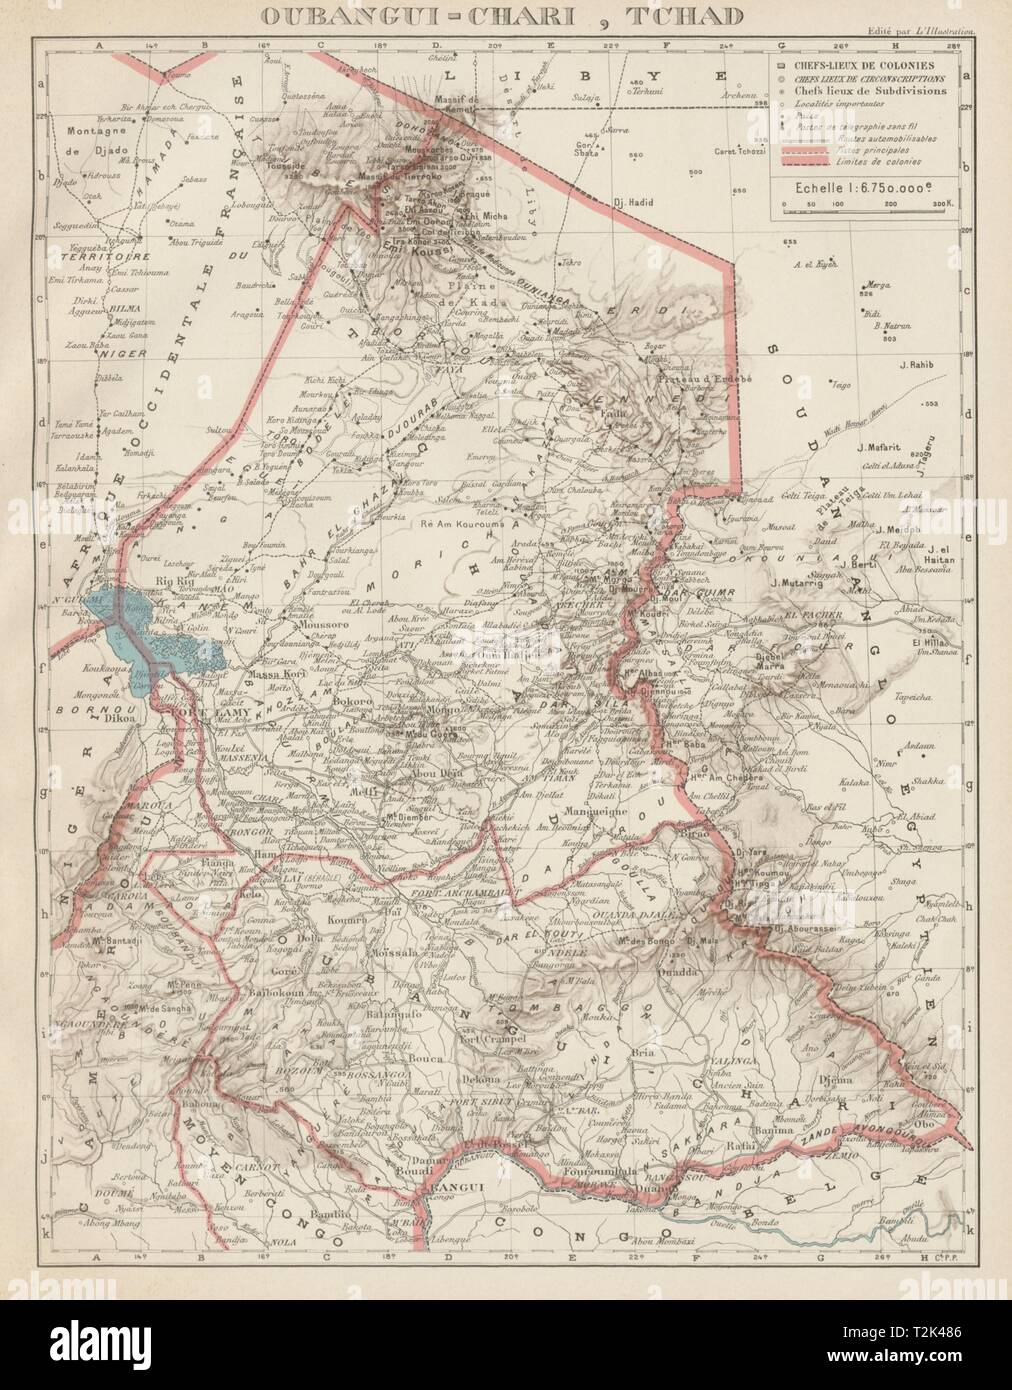 FRENCH COLONIAL CHAD & UBANGI-SHARI (C.A.R.). Oubangui-Chari Tchad 1929 map - Stock Image